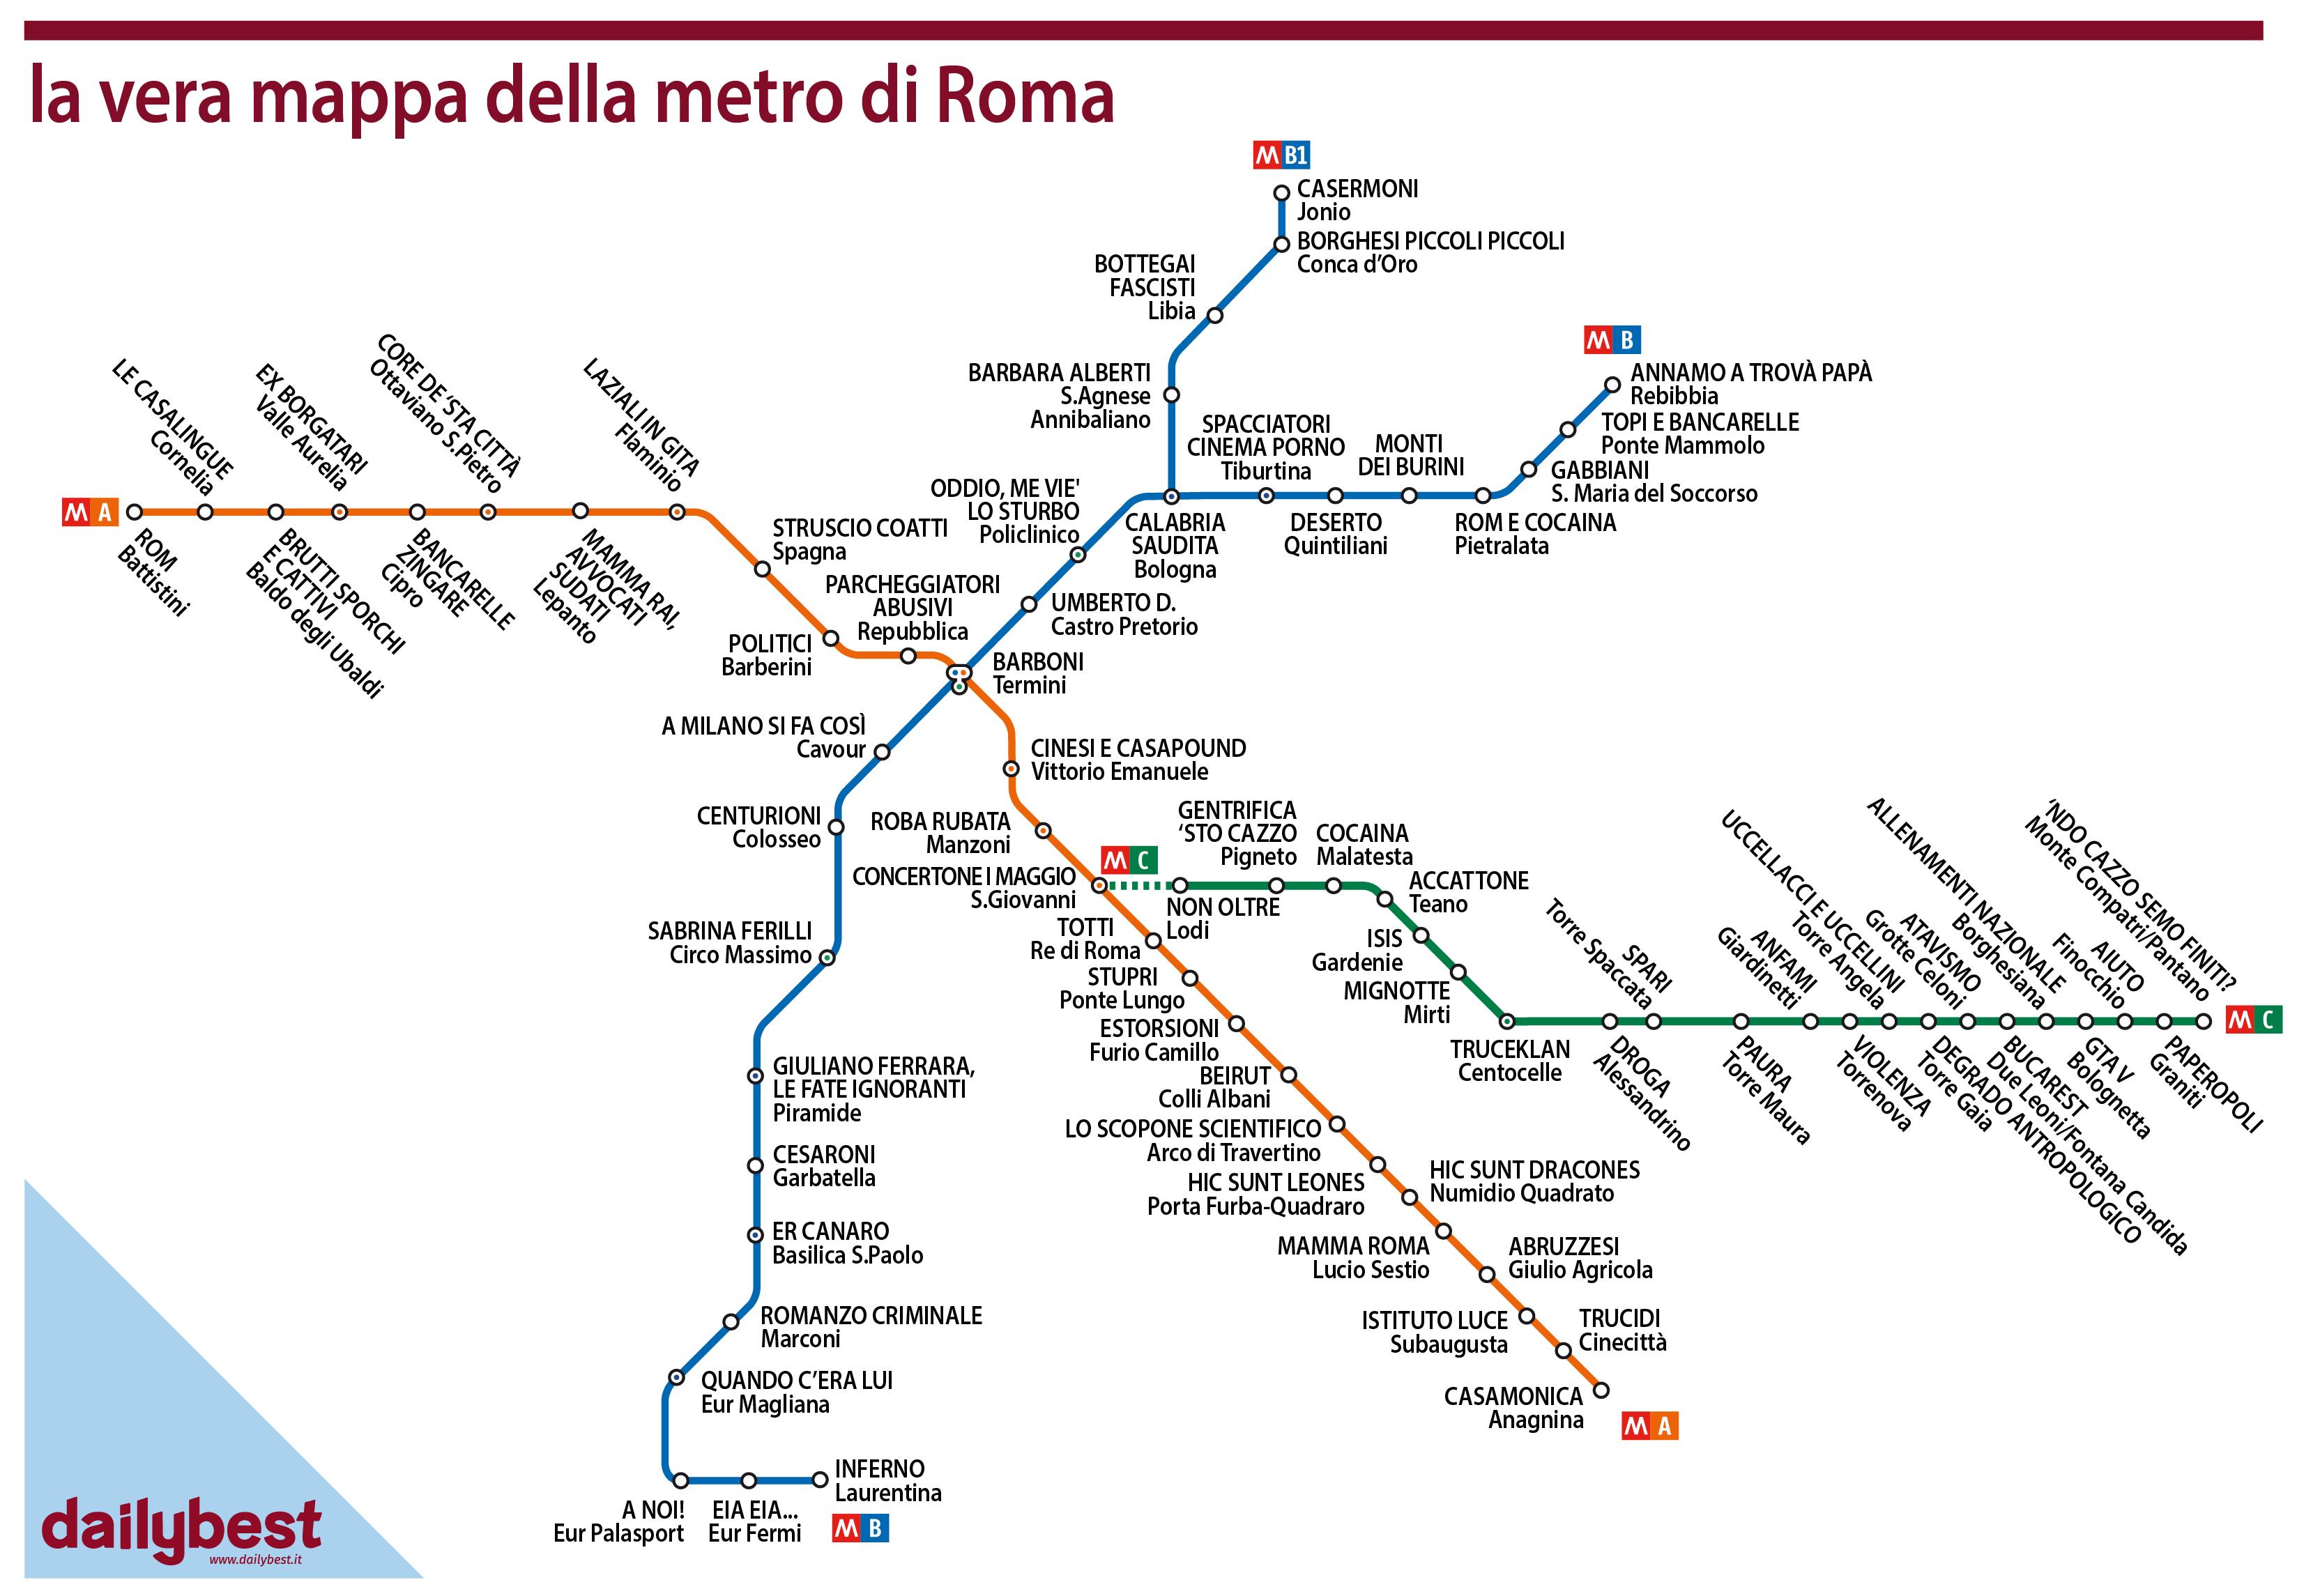 LA-METRO-DI-ROMA-01.jpg